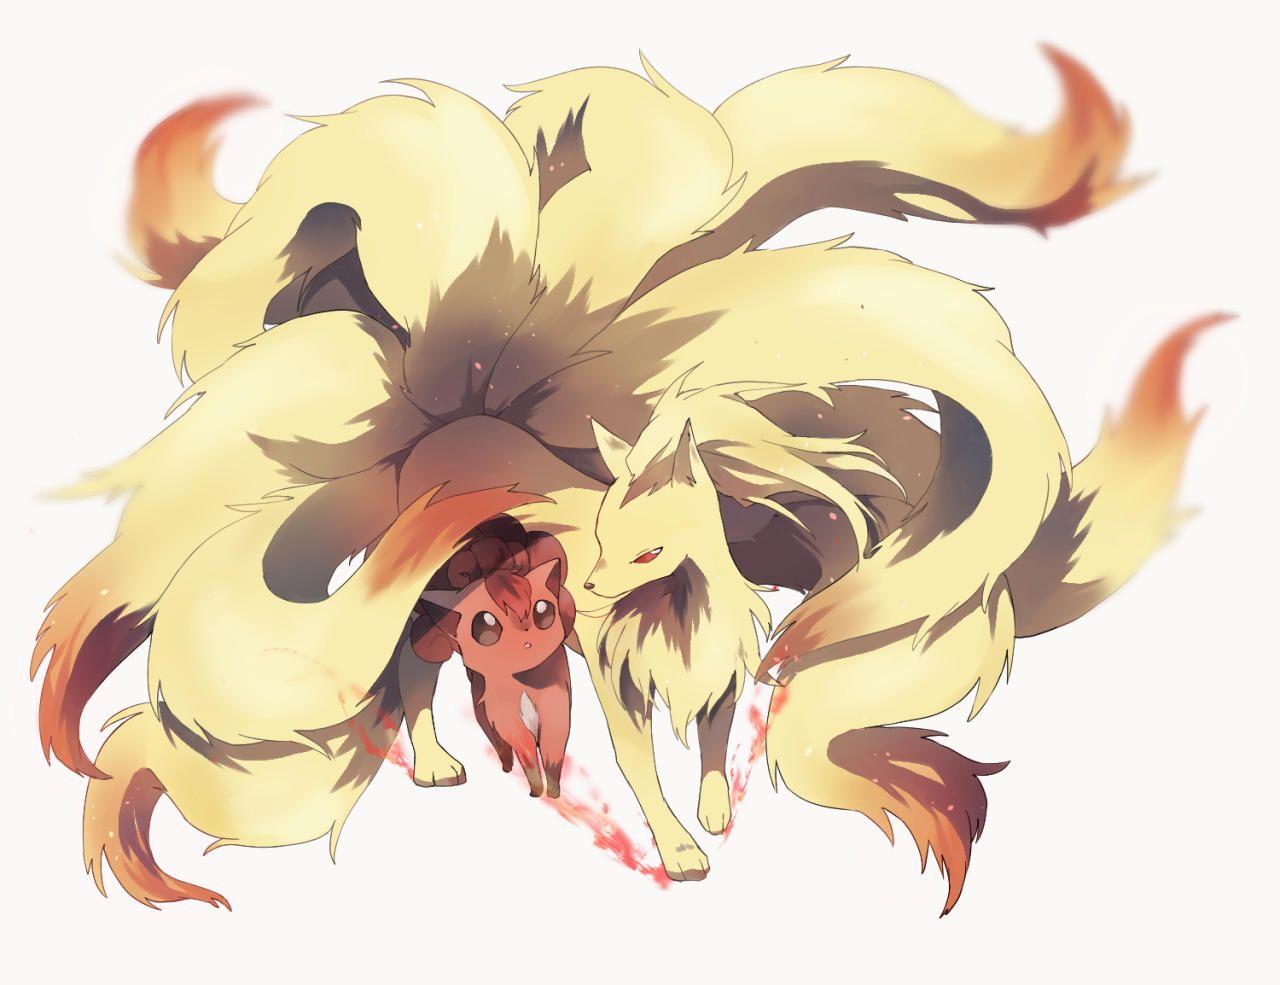 Vulpix & Ninetails | Pokémon | Pokemon, Pokemon ninetales